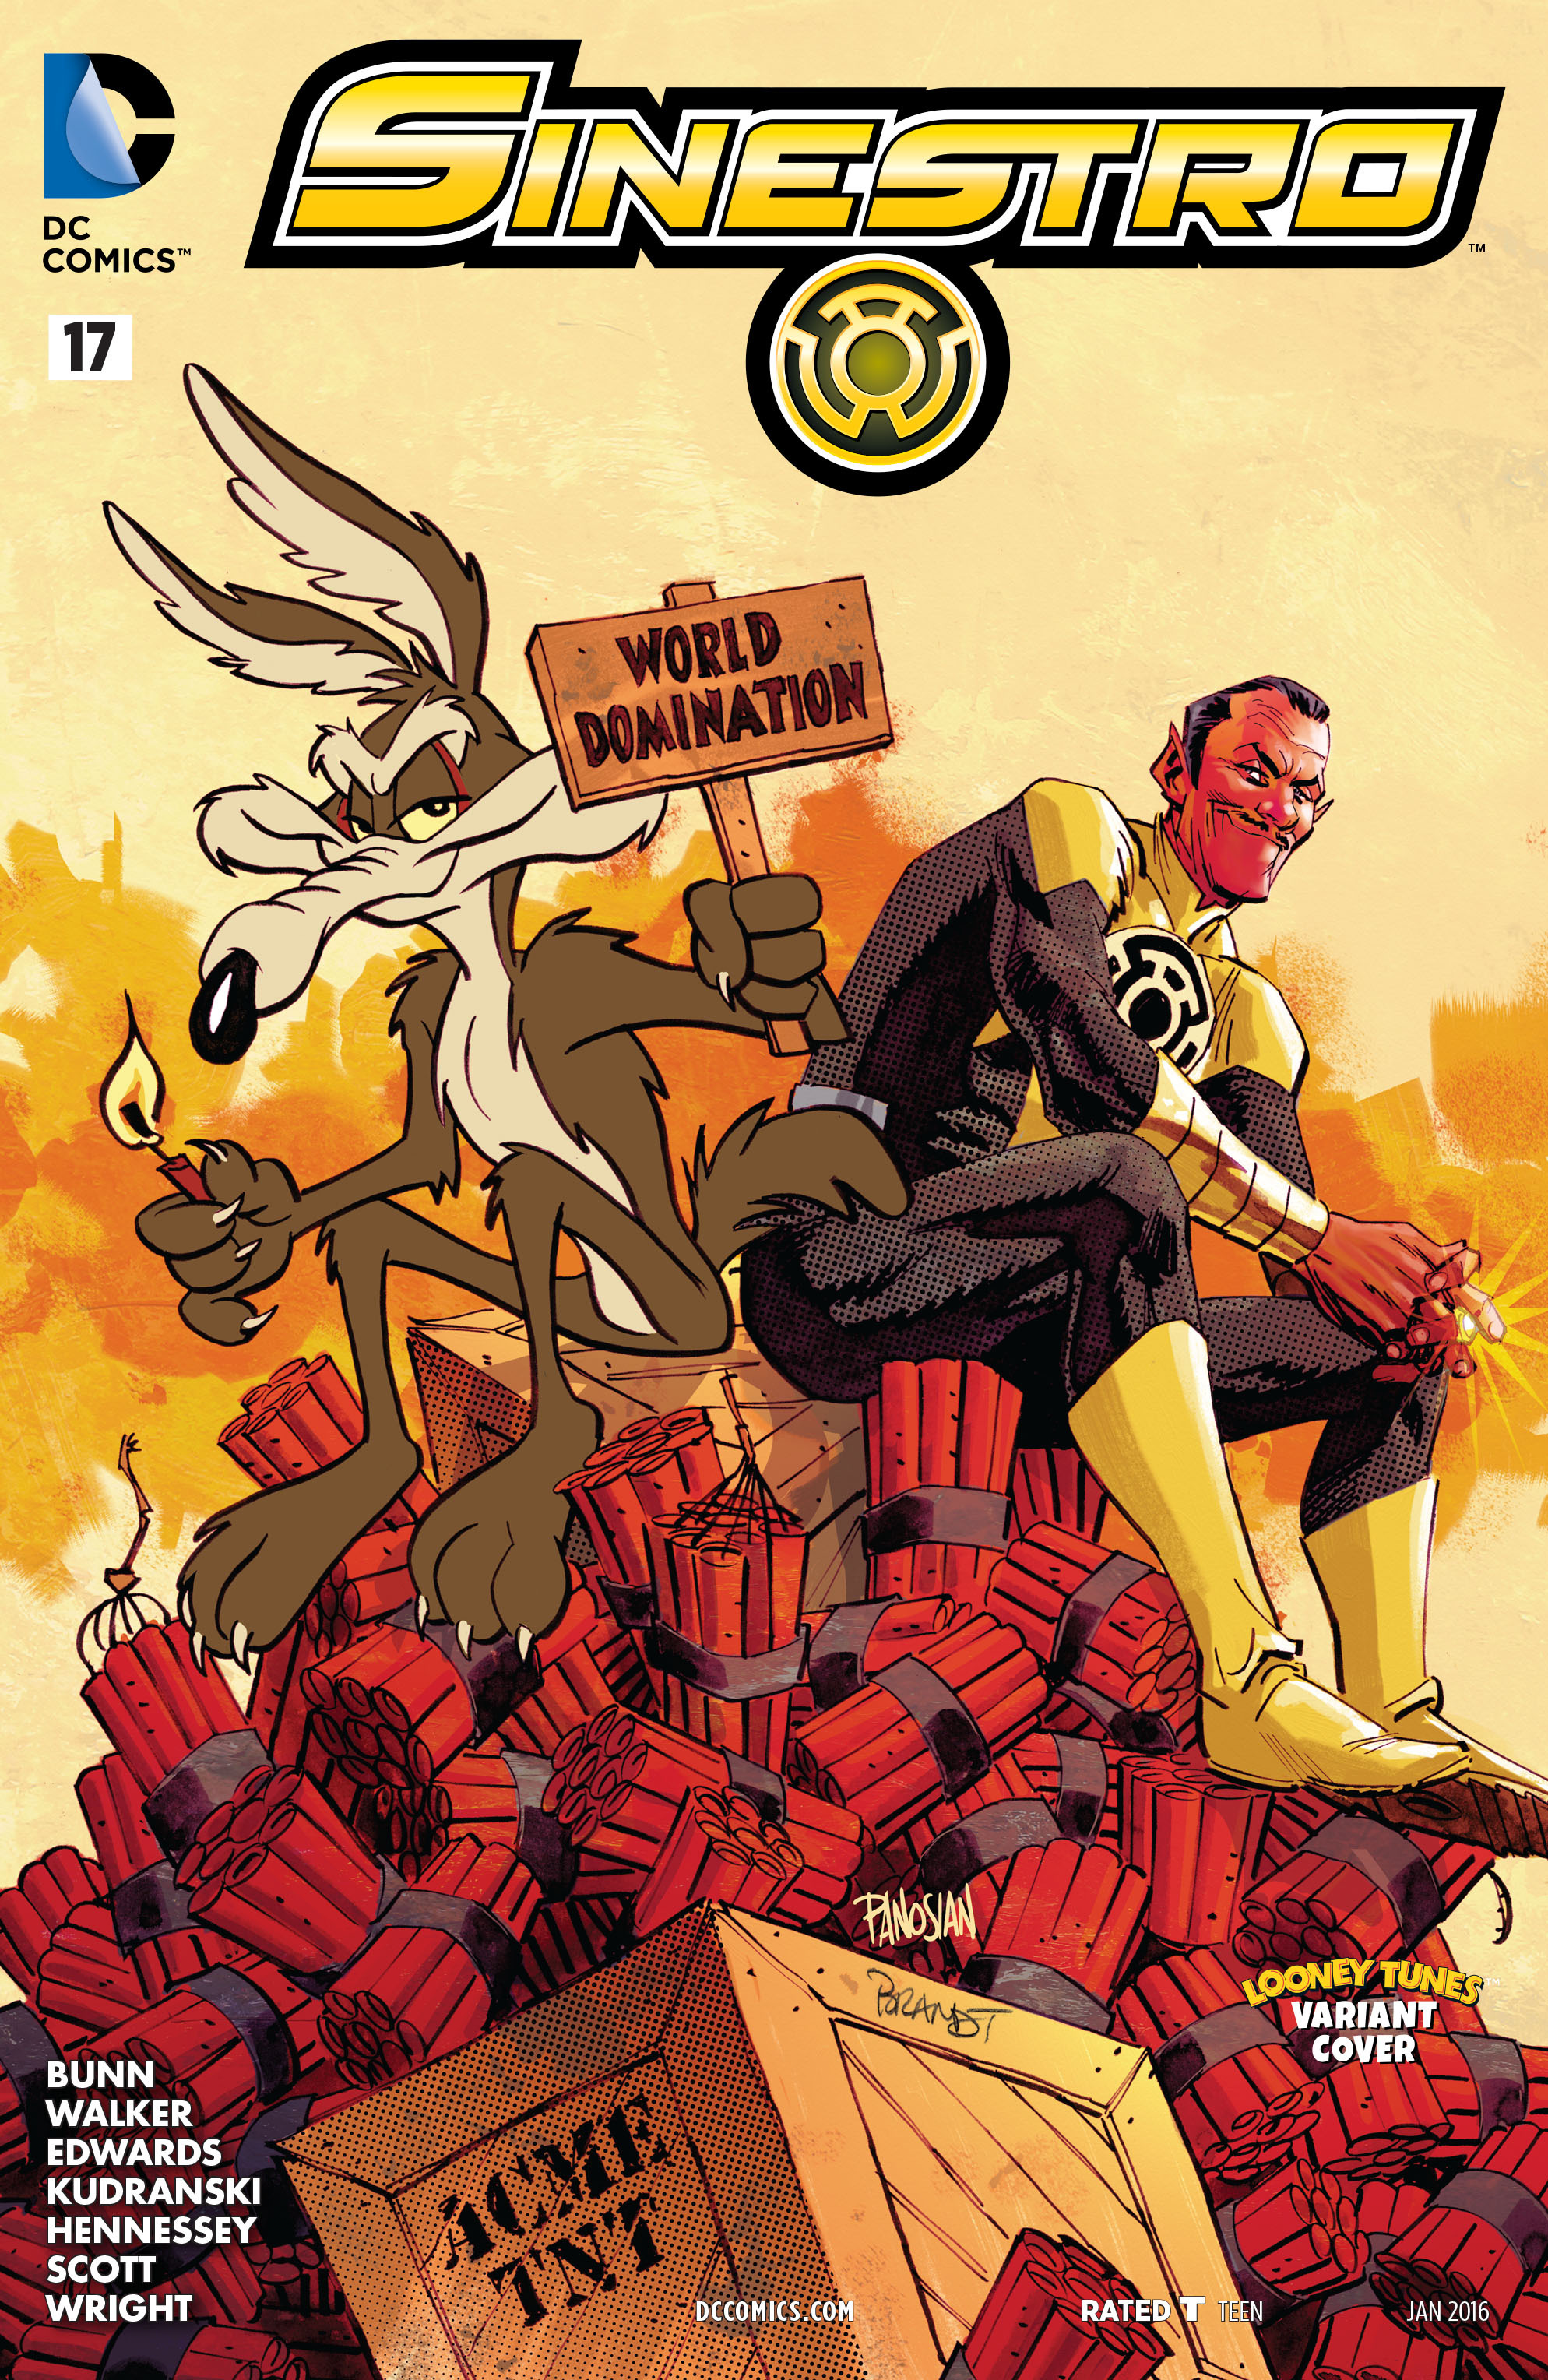 Read online Sinestro comic -  Issue #17 - 3